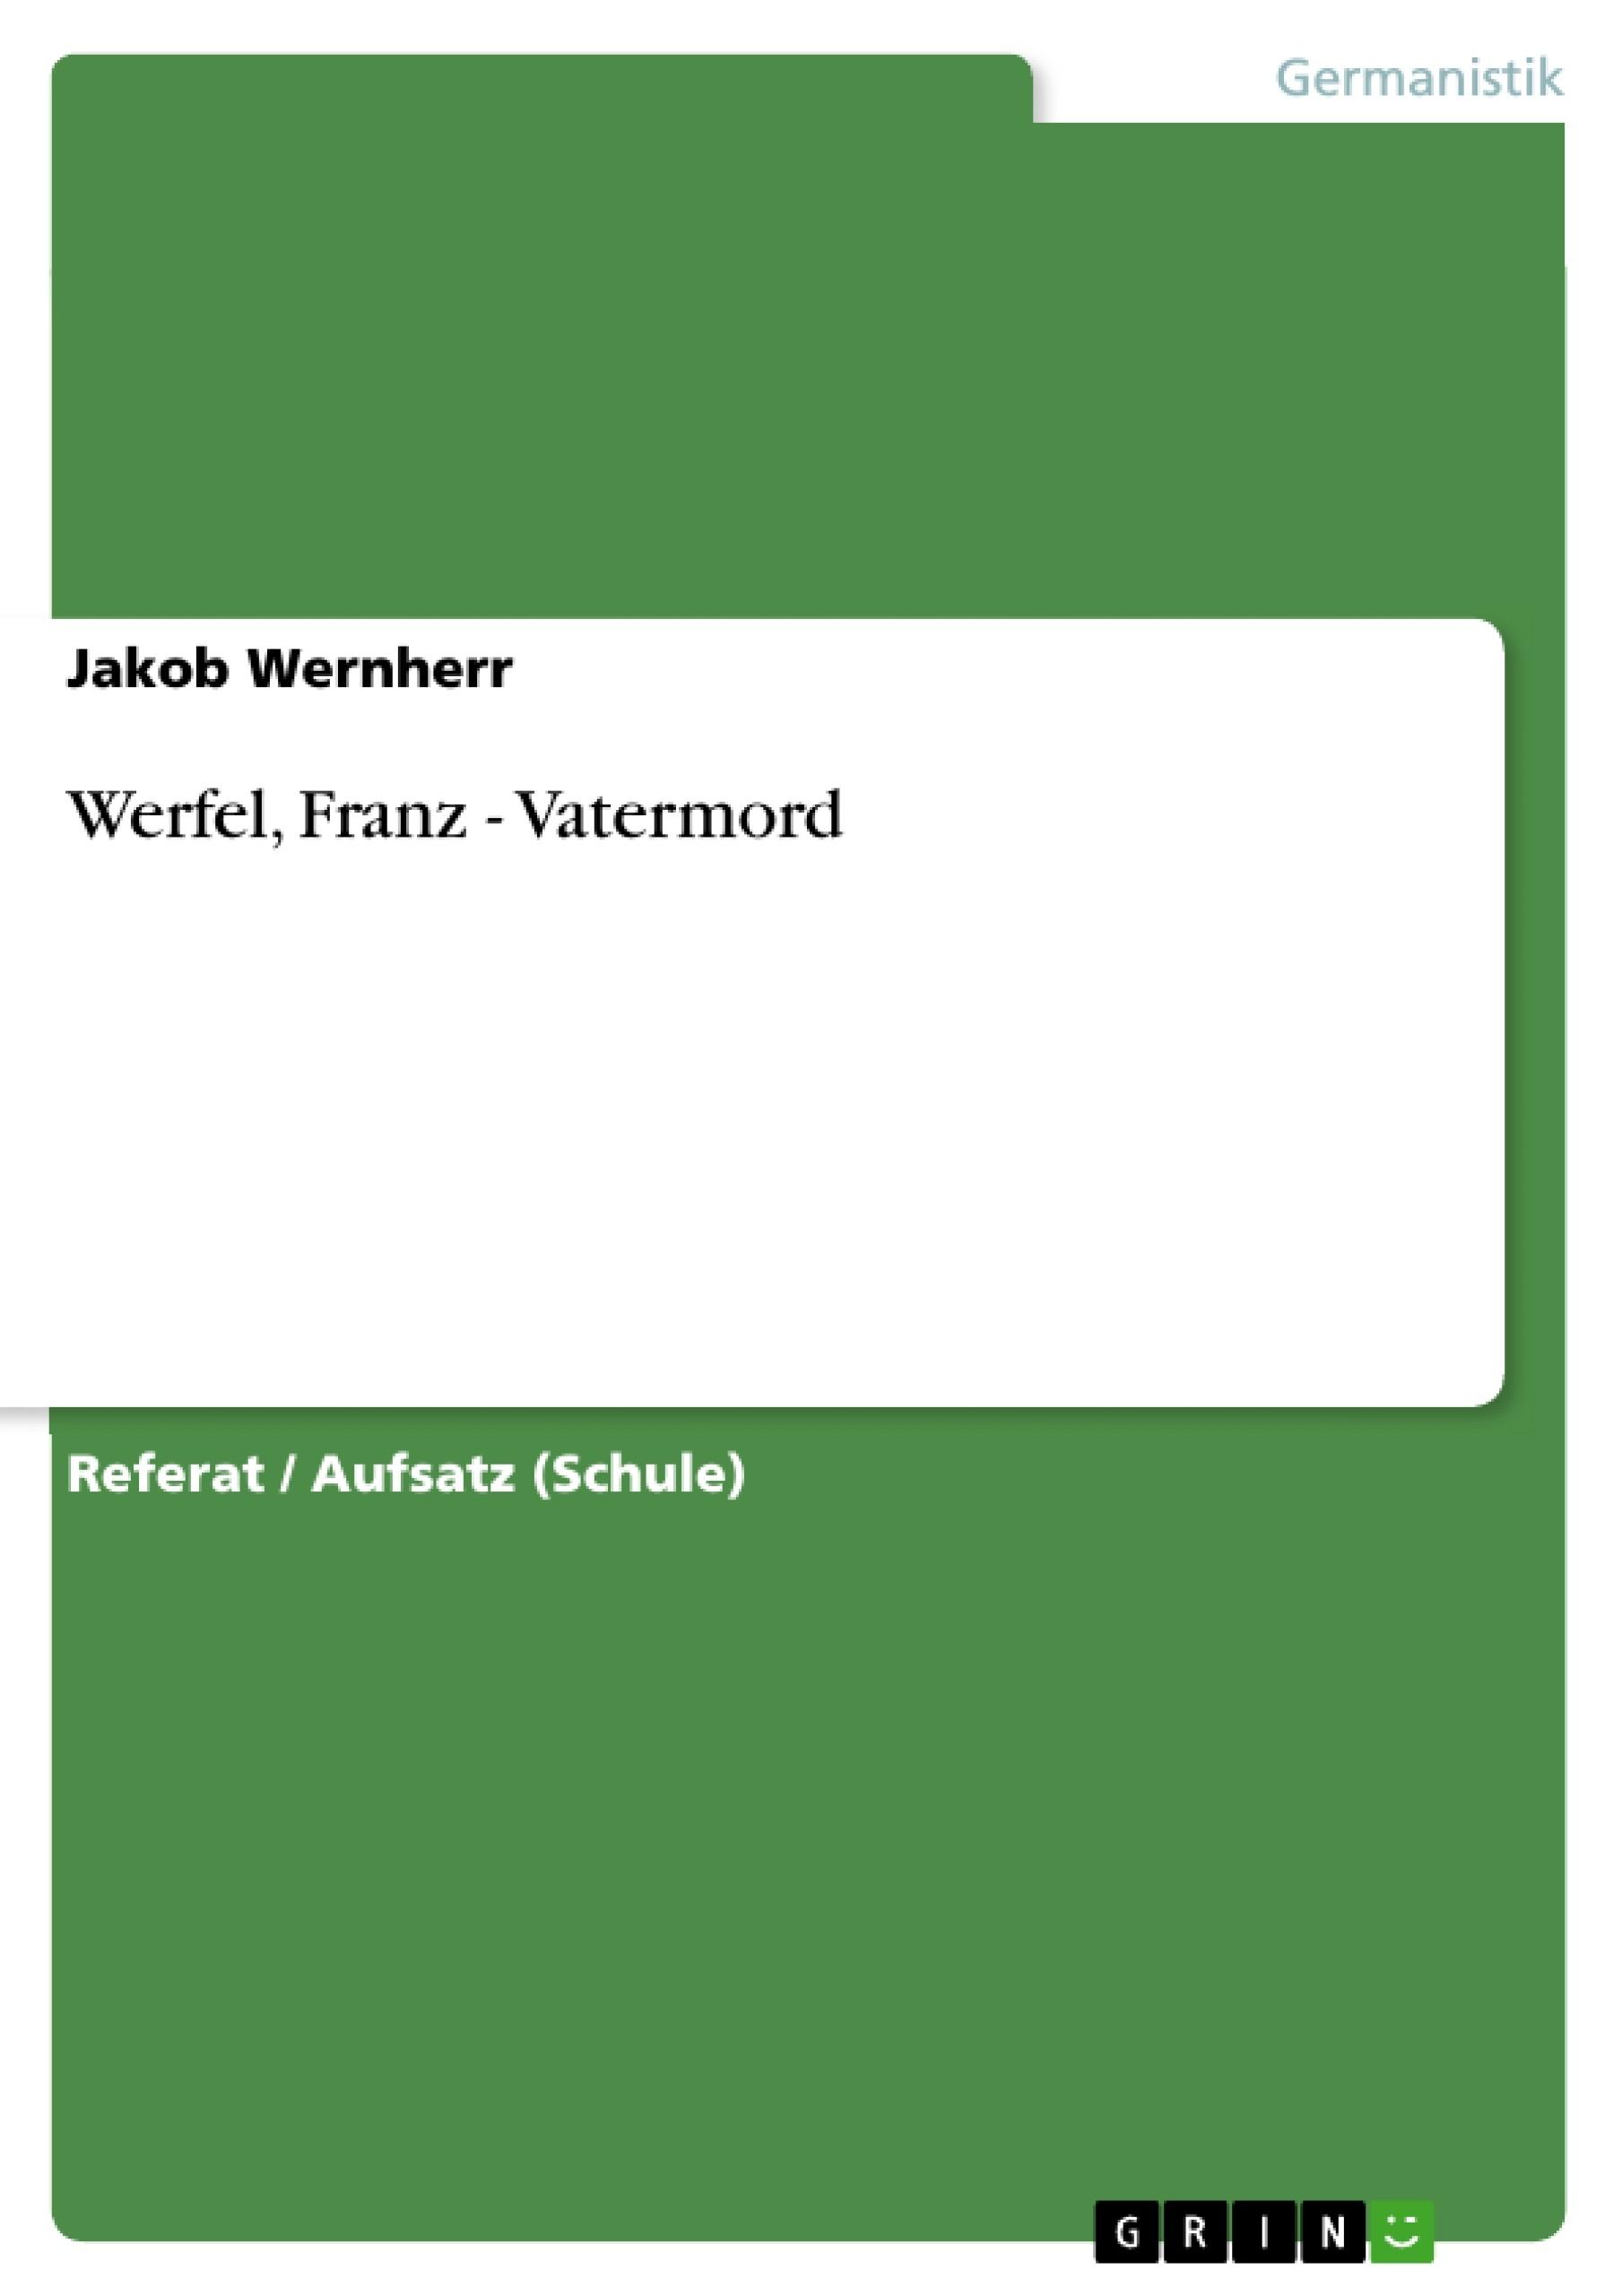 Titel: Werfel, Franz - Vatermord